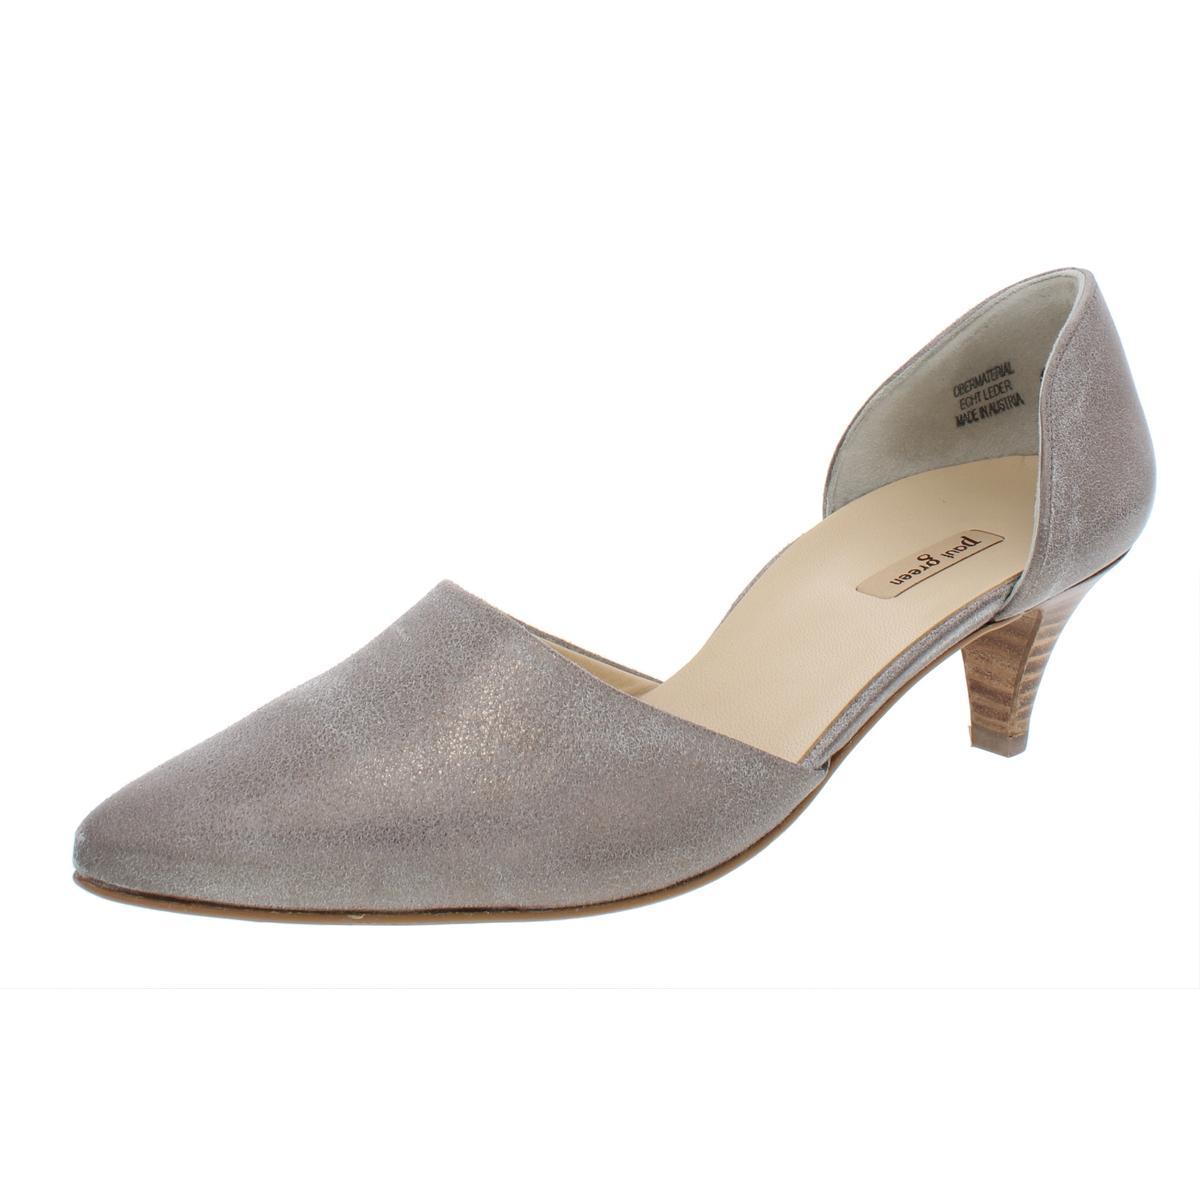 d25e246568 Details about Paul Green Womens Julia Metallic Leather Kitten Heel Pumps  Shoes BHFO 2902